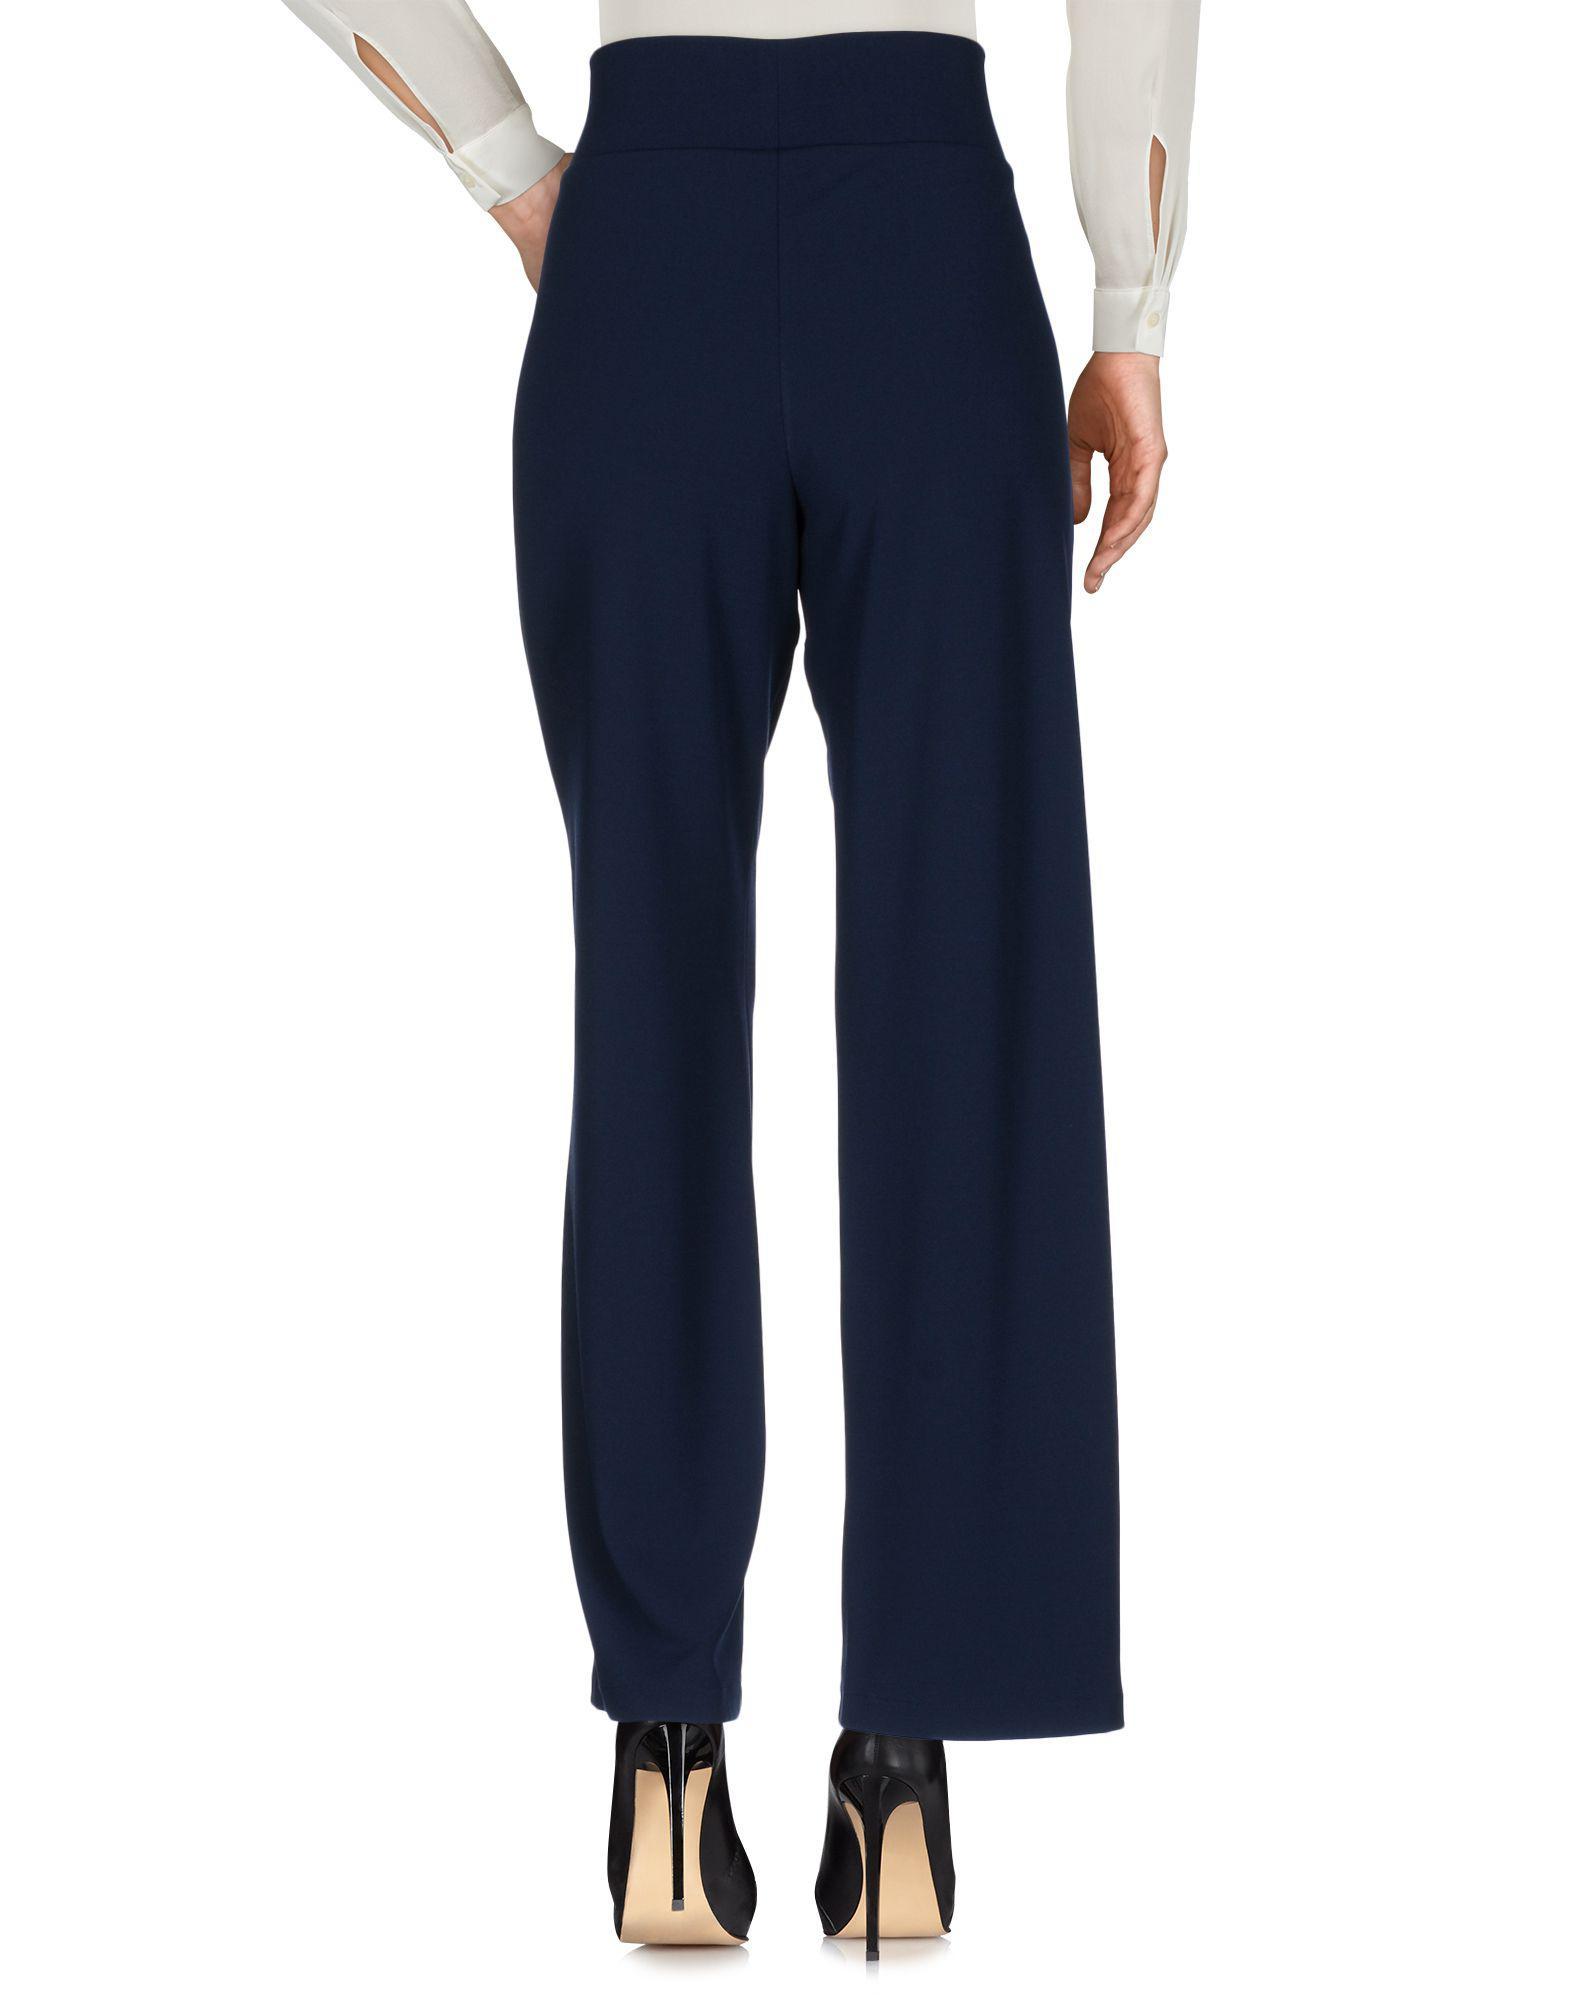 TROUSERS - Casual trousers Le Fate 100% Guaranteed Cheap Price VjFB8